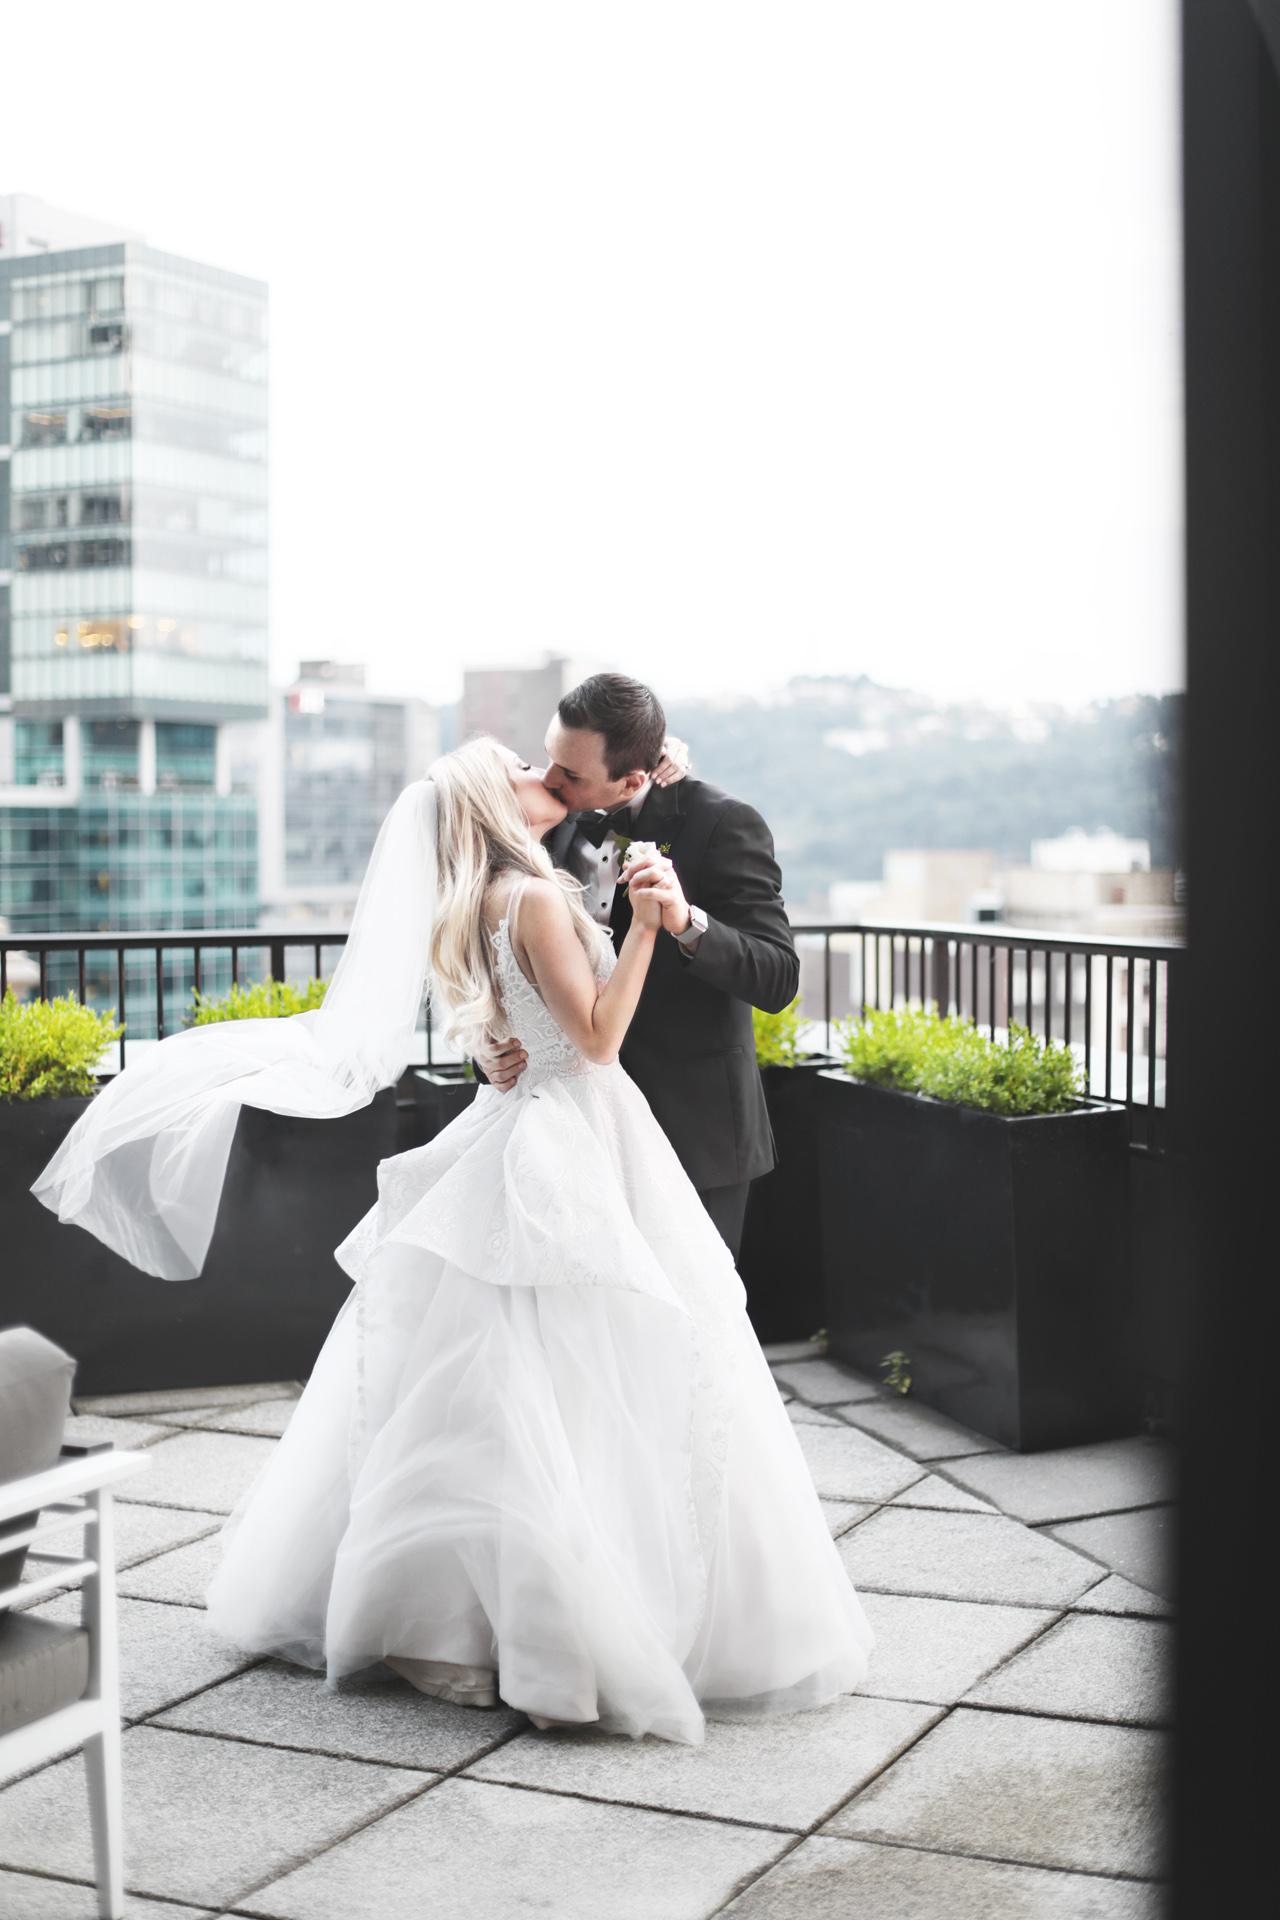 newlyweds at renaissance hotel pittsburgh